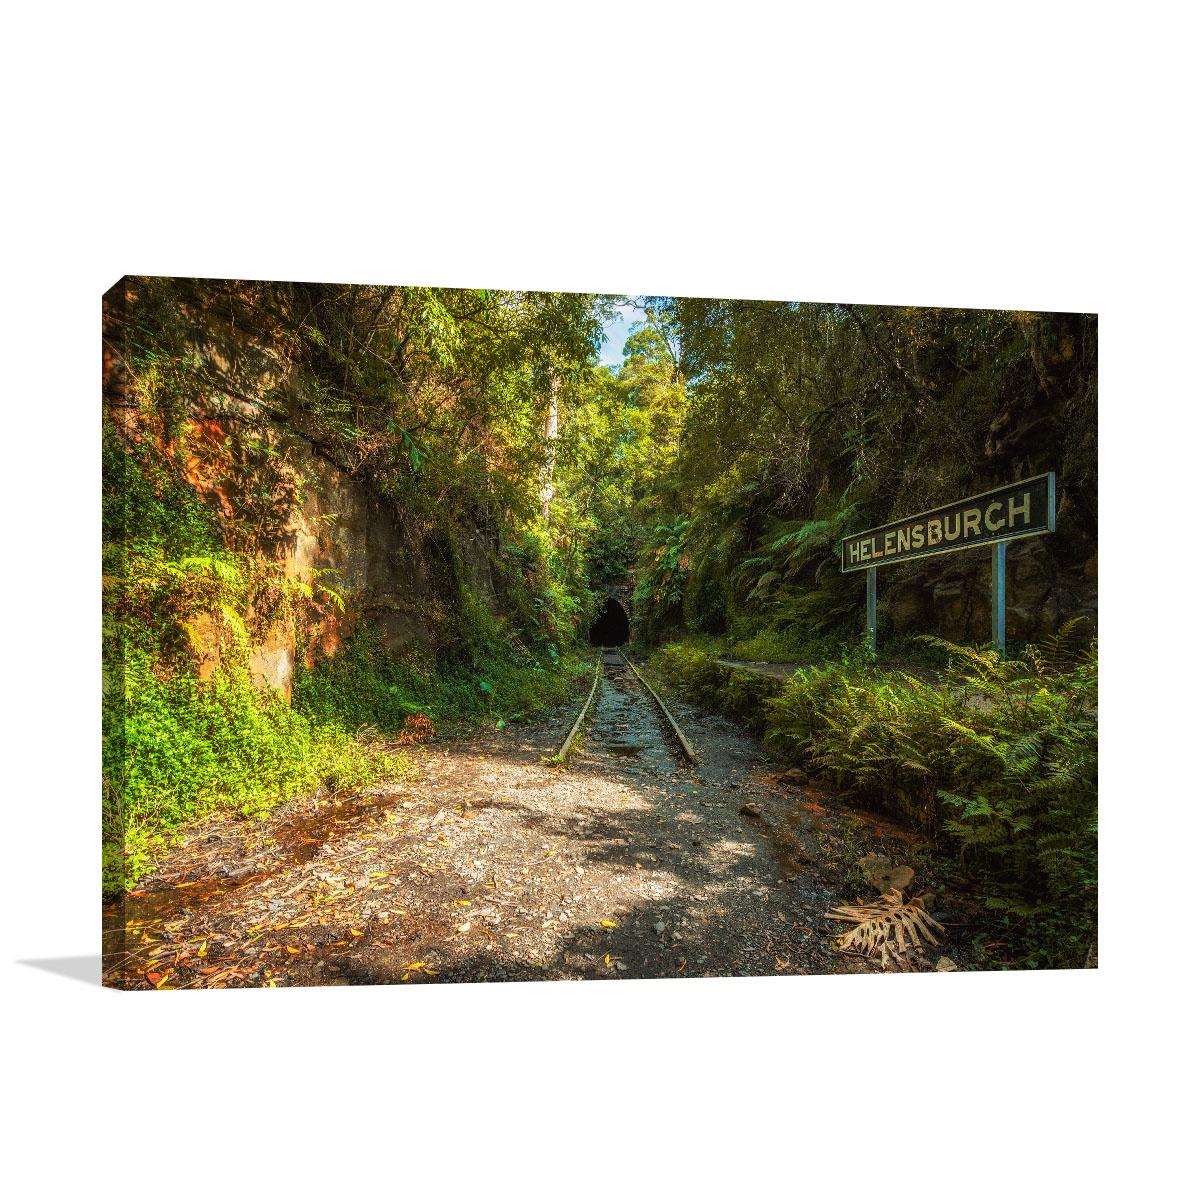 New South Wales Photo Art Print Railway Station